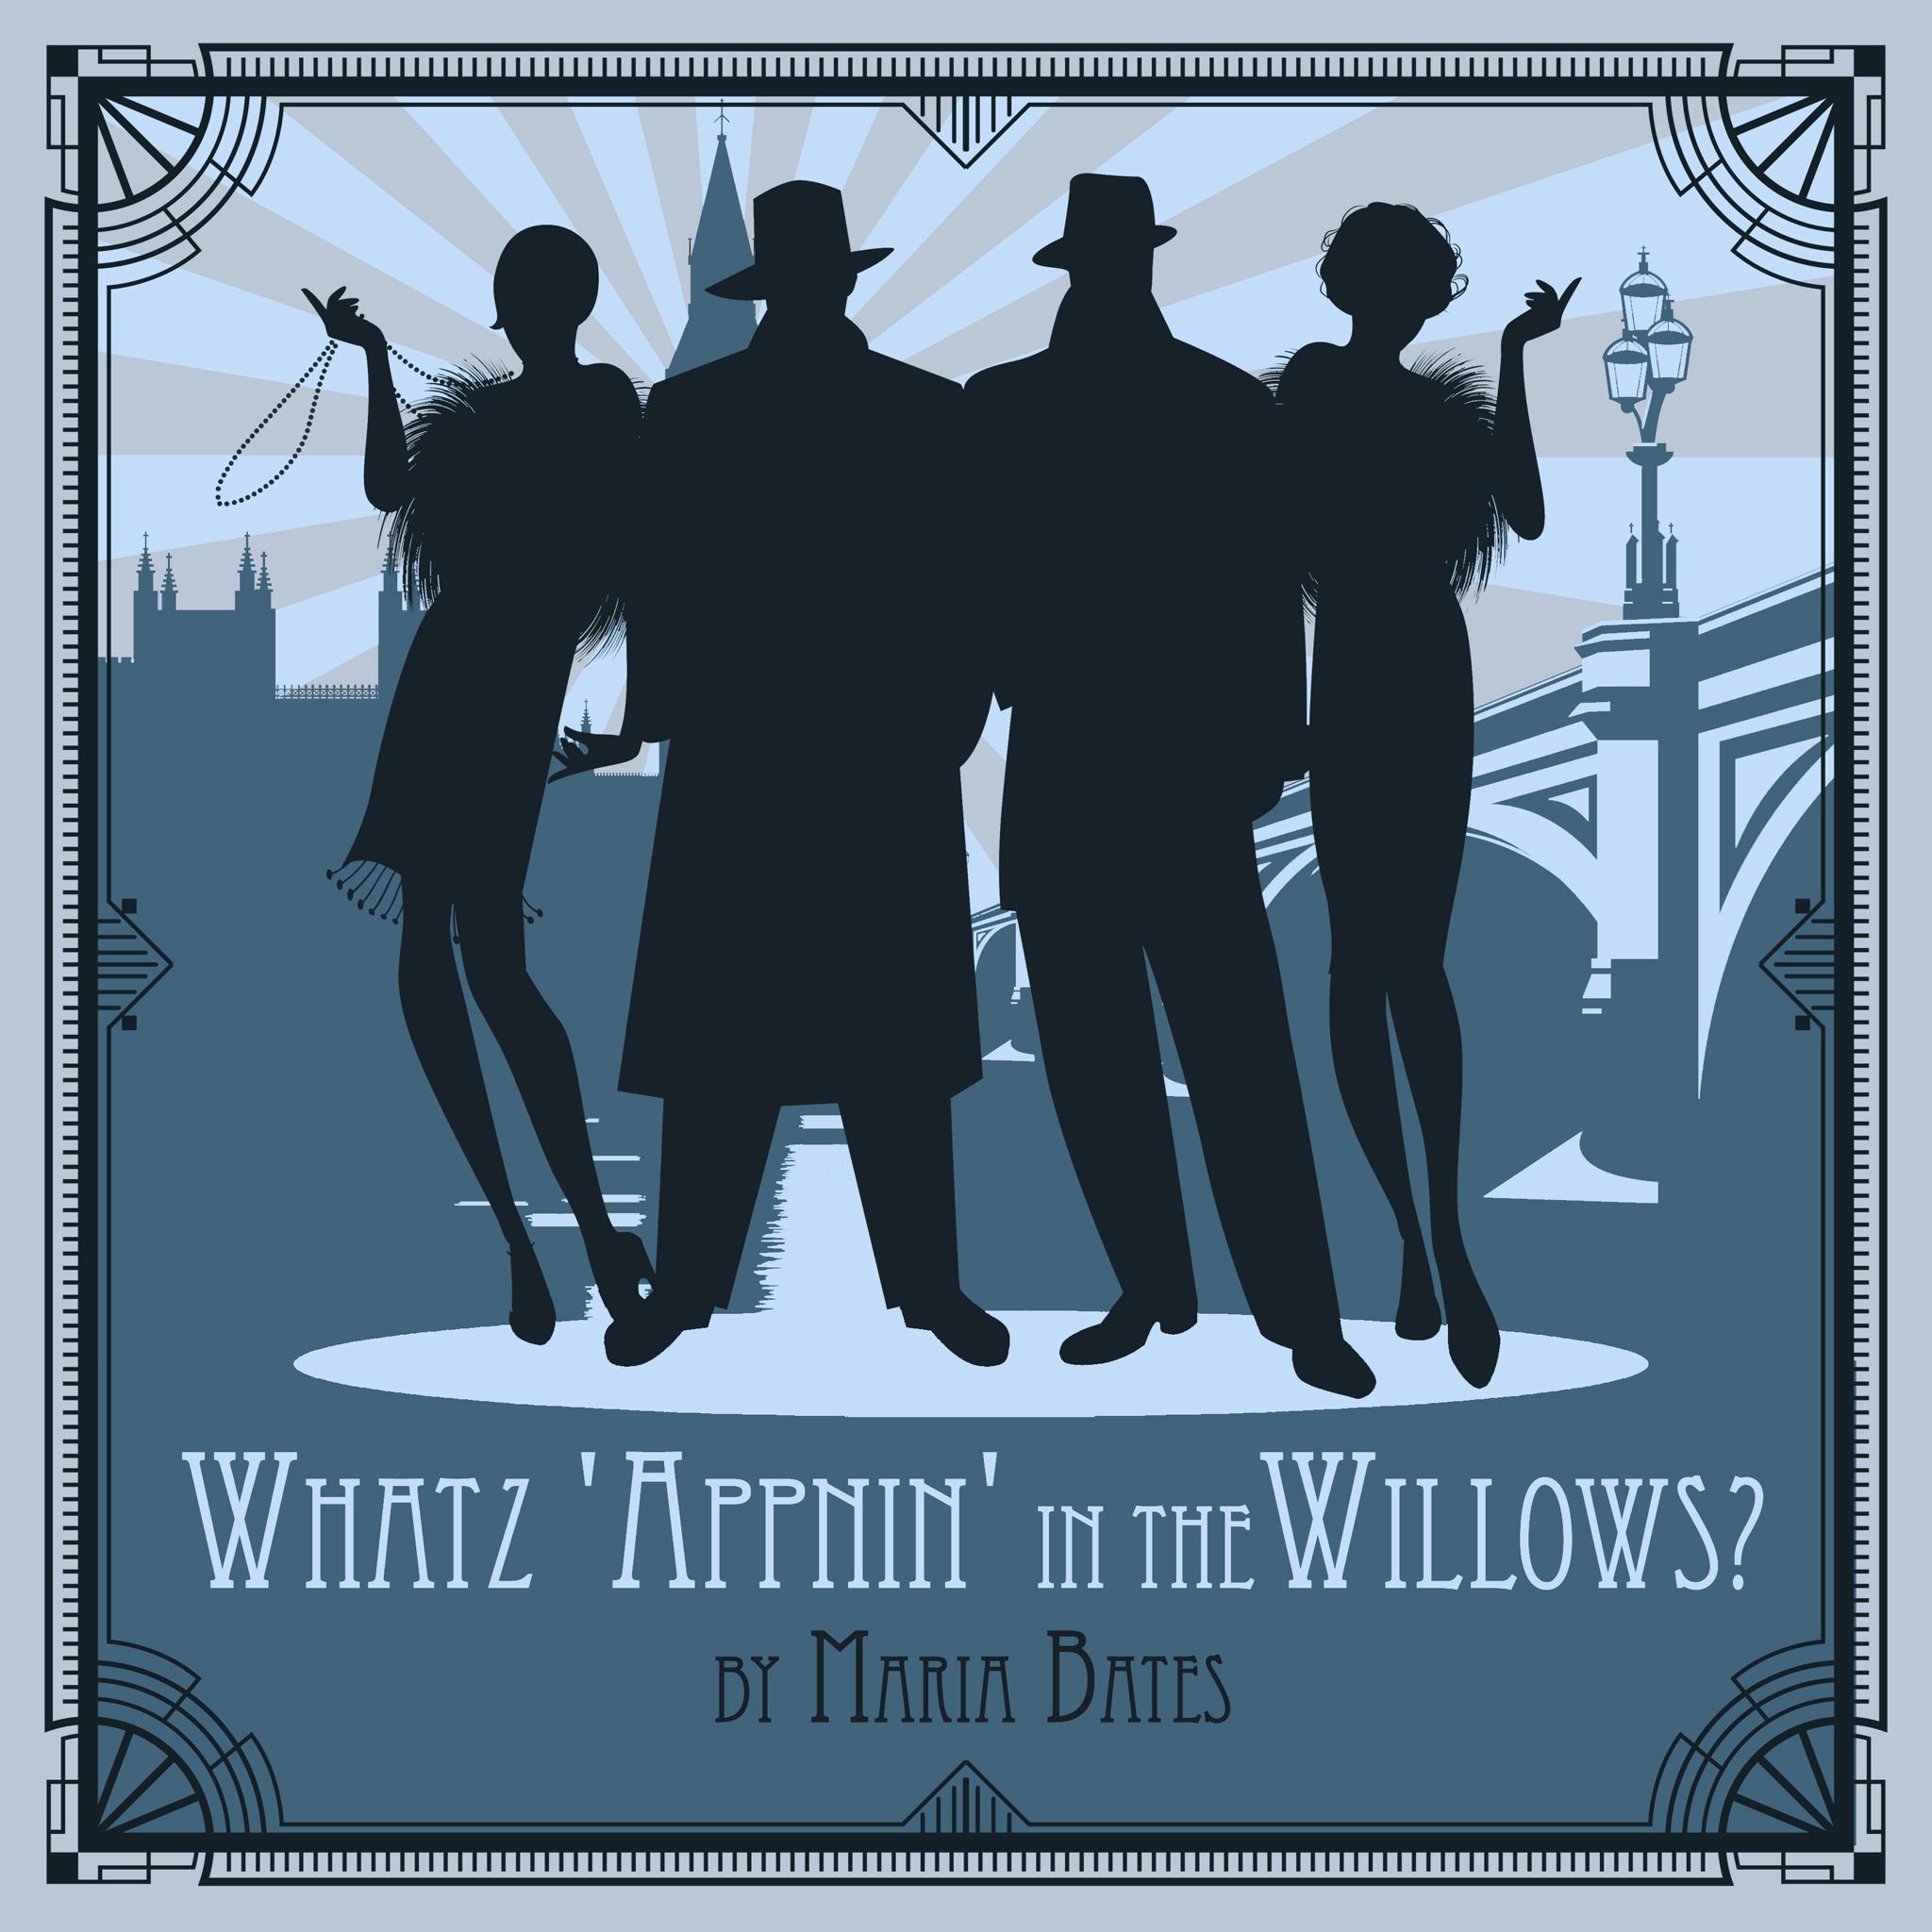 'Whatz 'Appnin' in the Willows'?